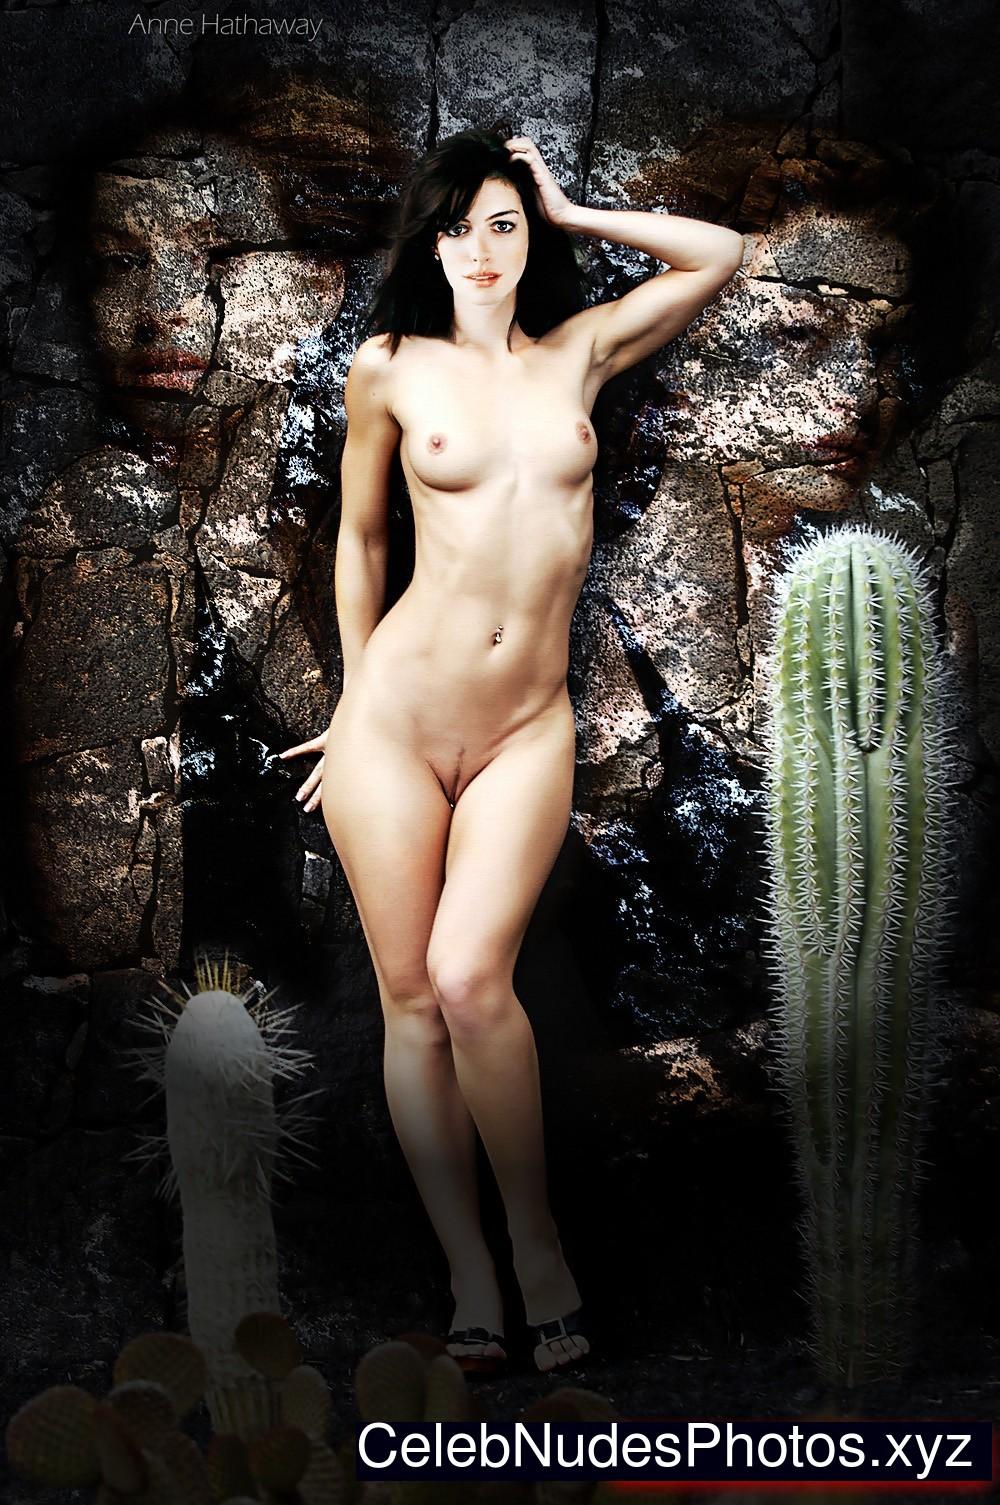 Anne Hathaway nude celebrities